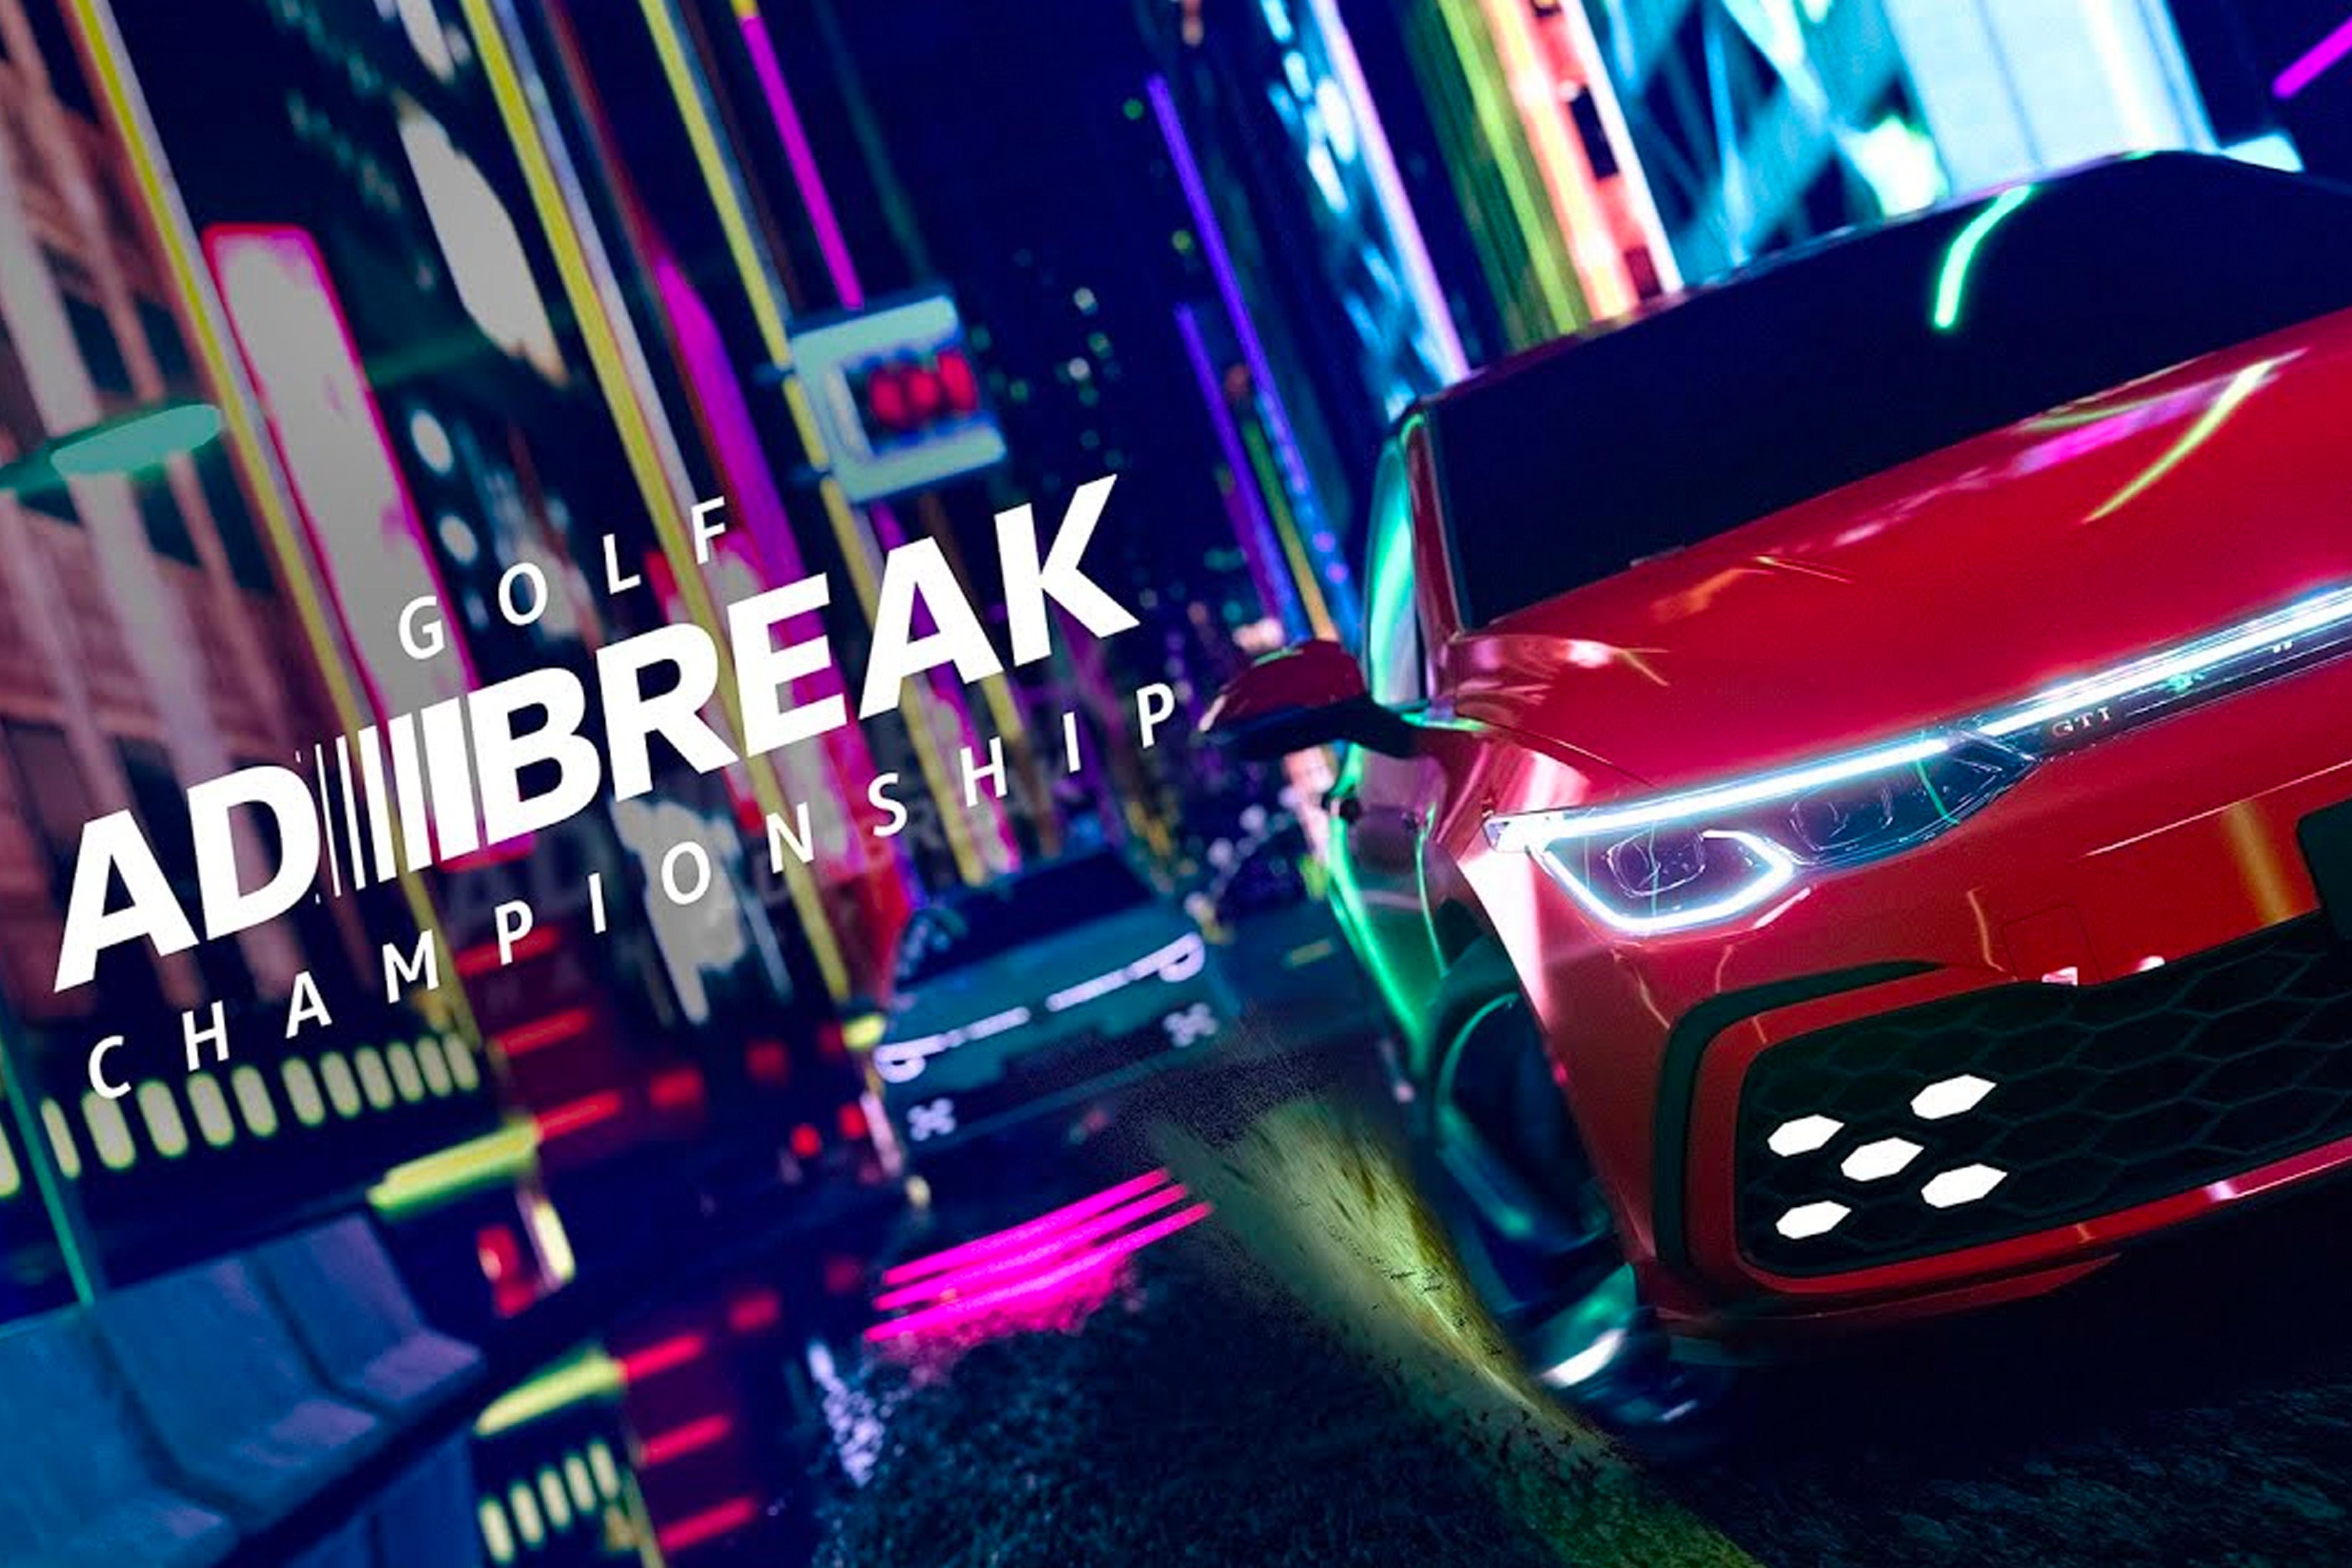 Volkswagen campaign image: Adbreak championship